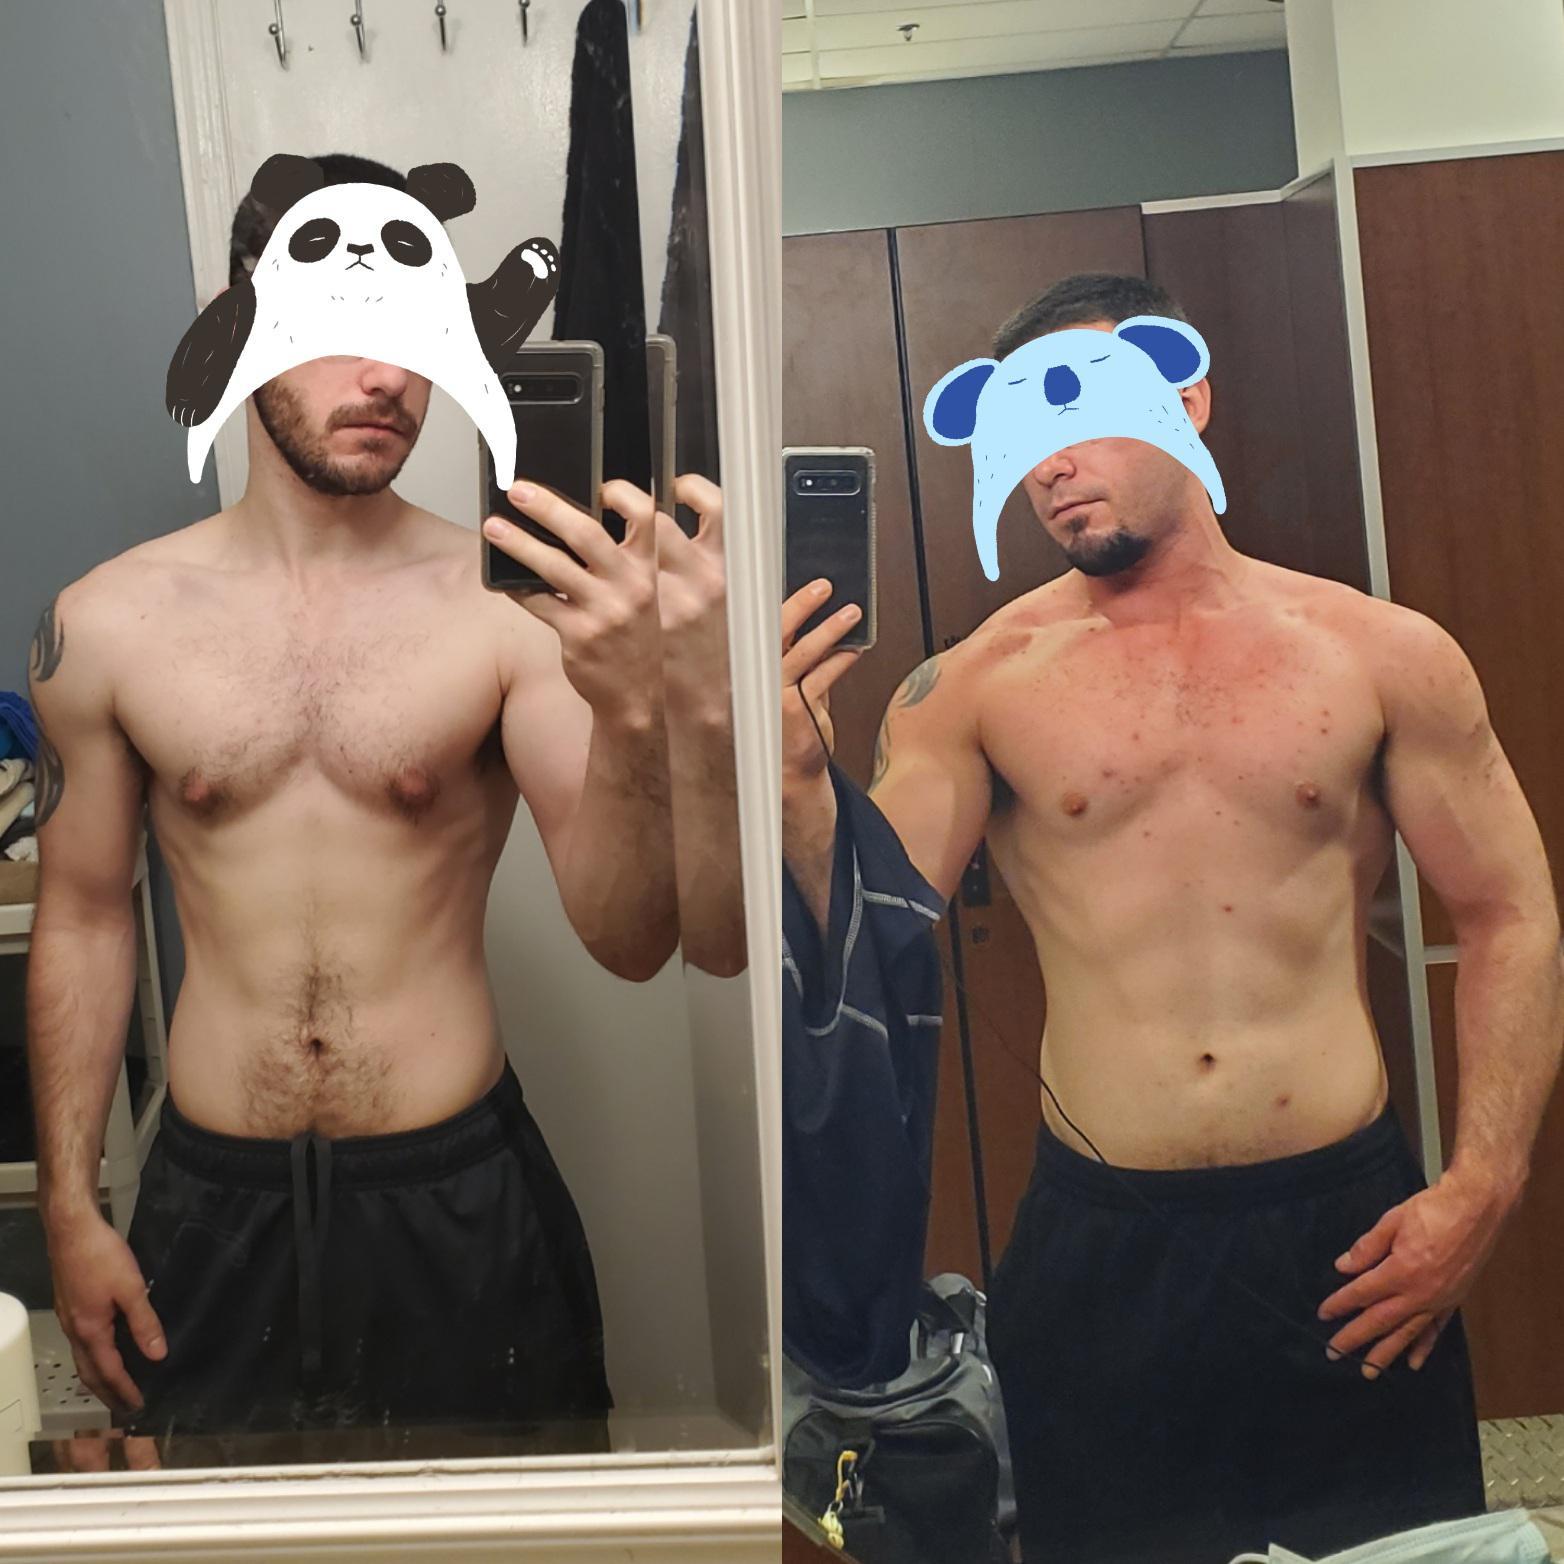 5 foot 9 Male 34 lbs Muscle Gain 138 lbs to 172 lbs